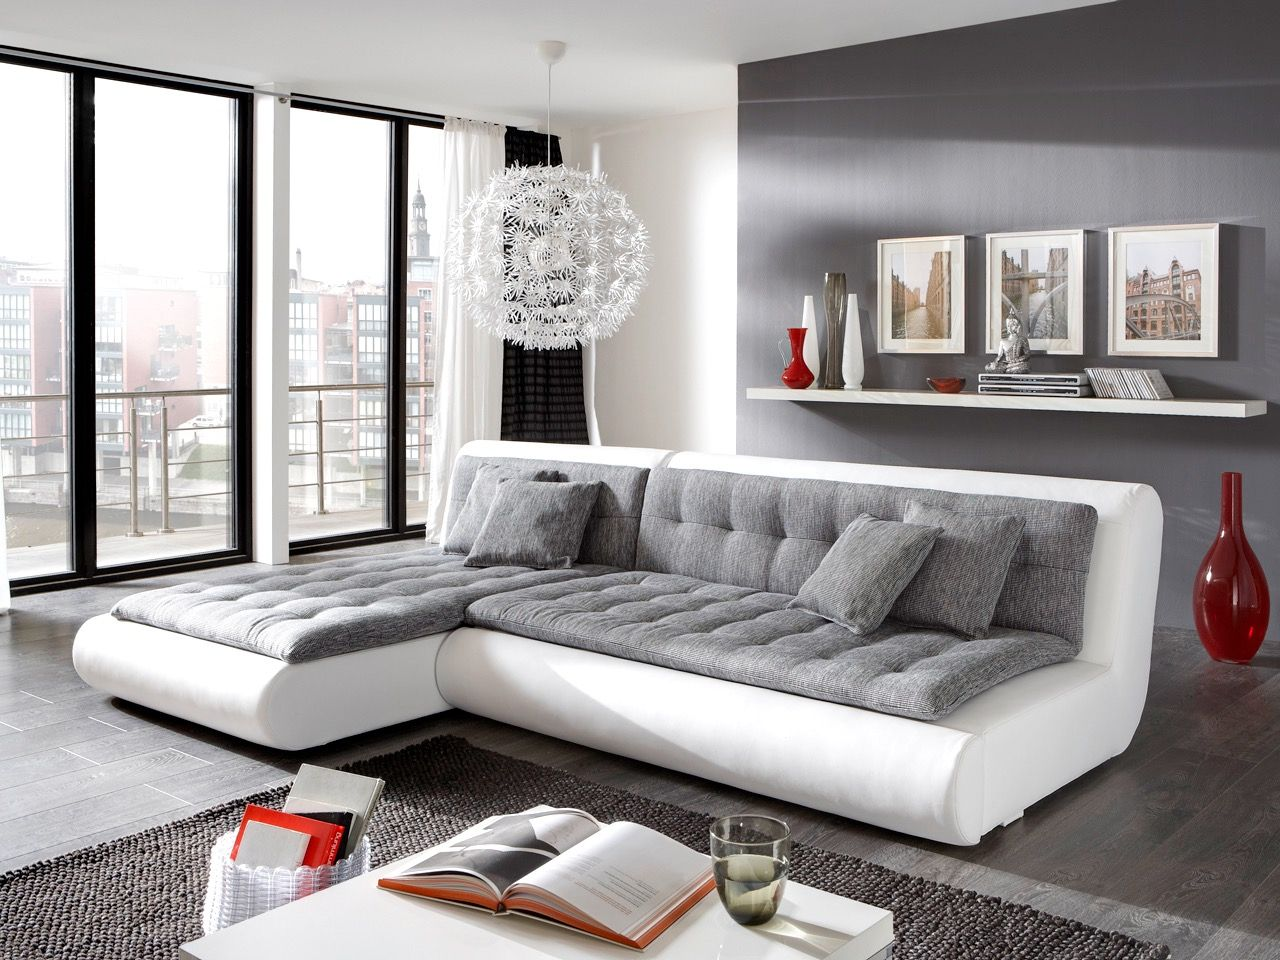 Wohnzimmer Grau Weiss Lila Living Room Grey Living Room White